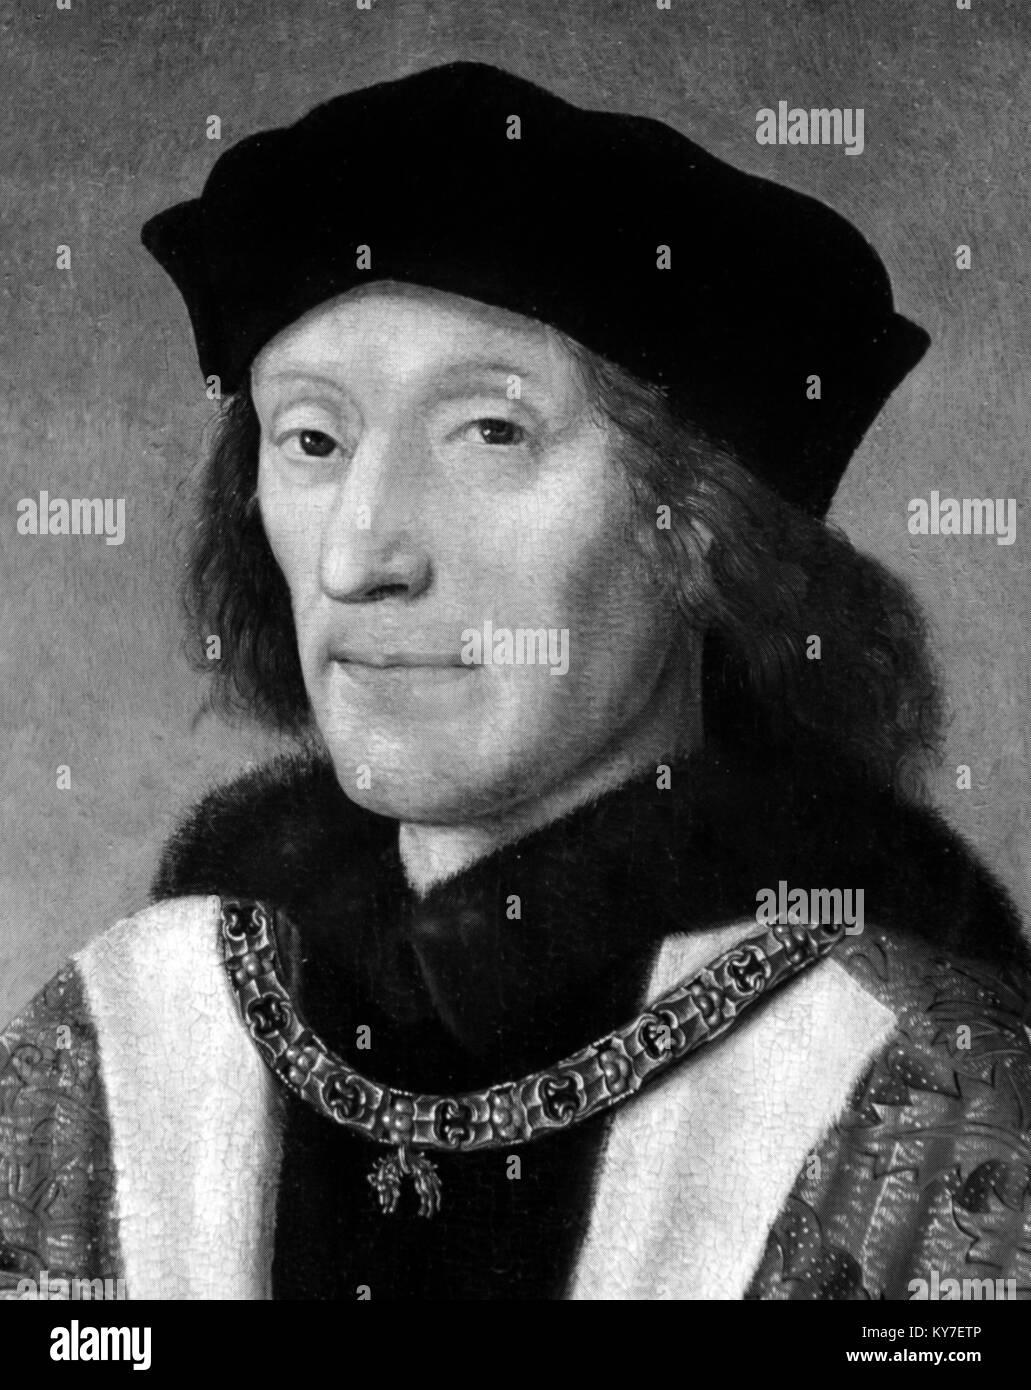 Henry VII. Portrait of King Henry VII (1457-1509) - Stock Image